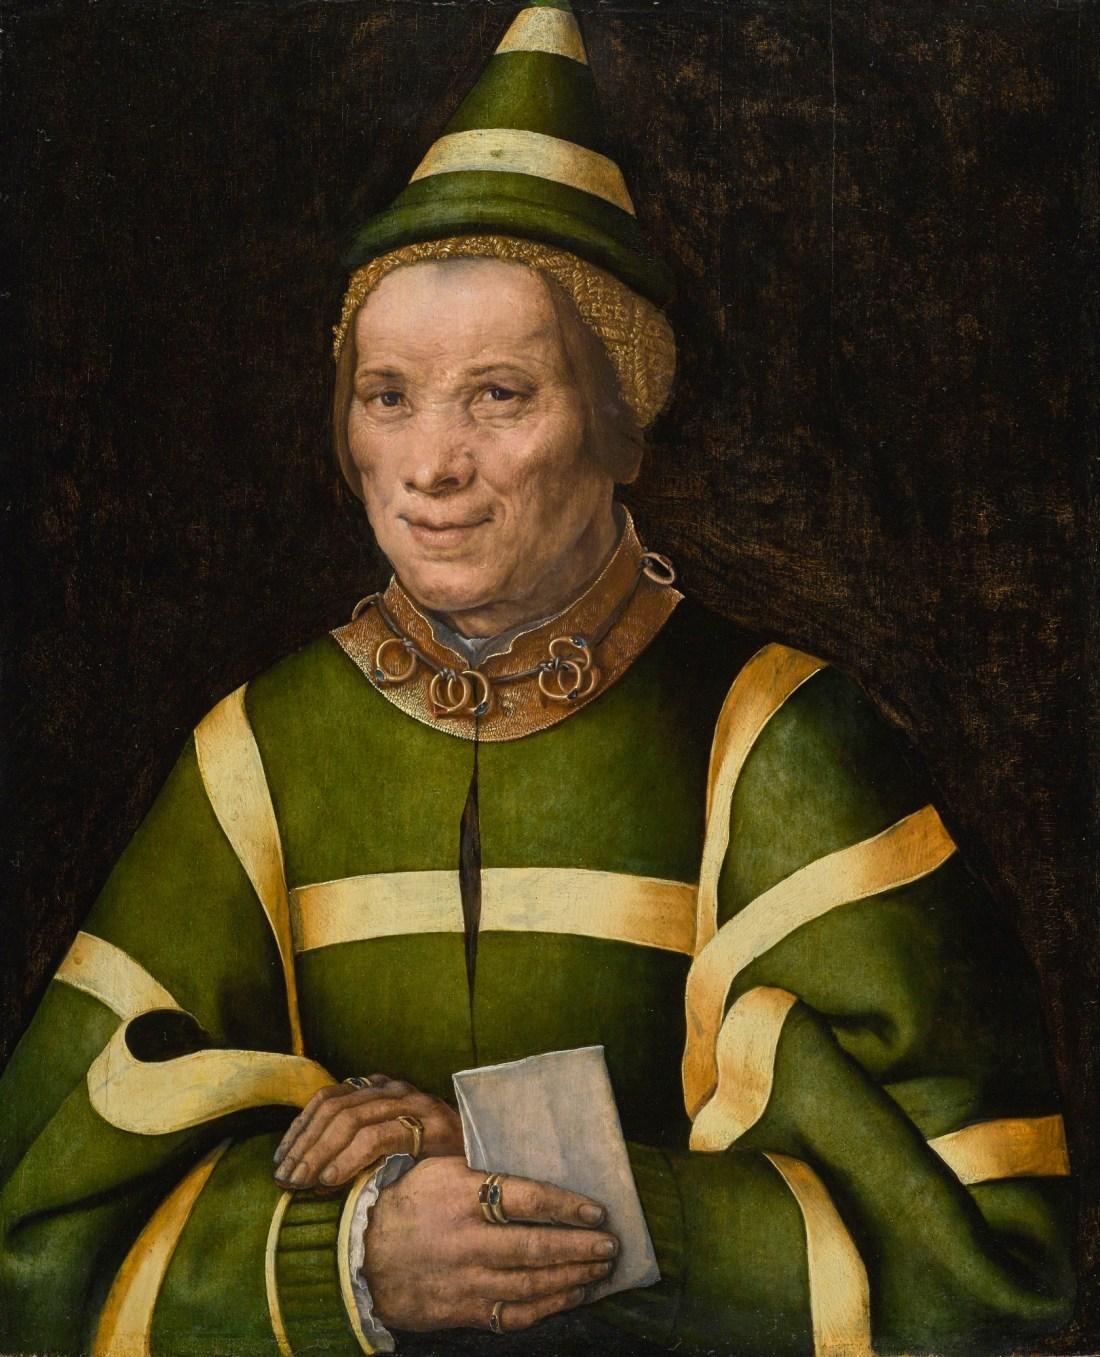 A 16th century oil on oak panel portrait of Elisabet, court fool of Anne of Hungary, painted by Jan Sanders van Hemessen.